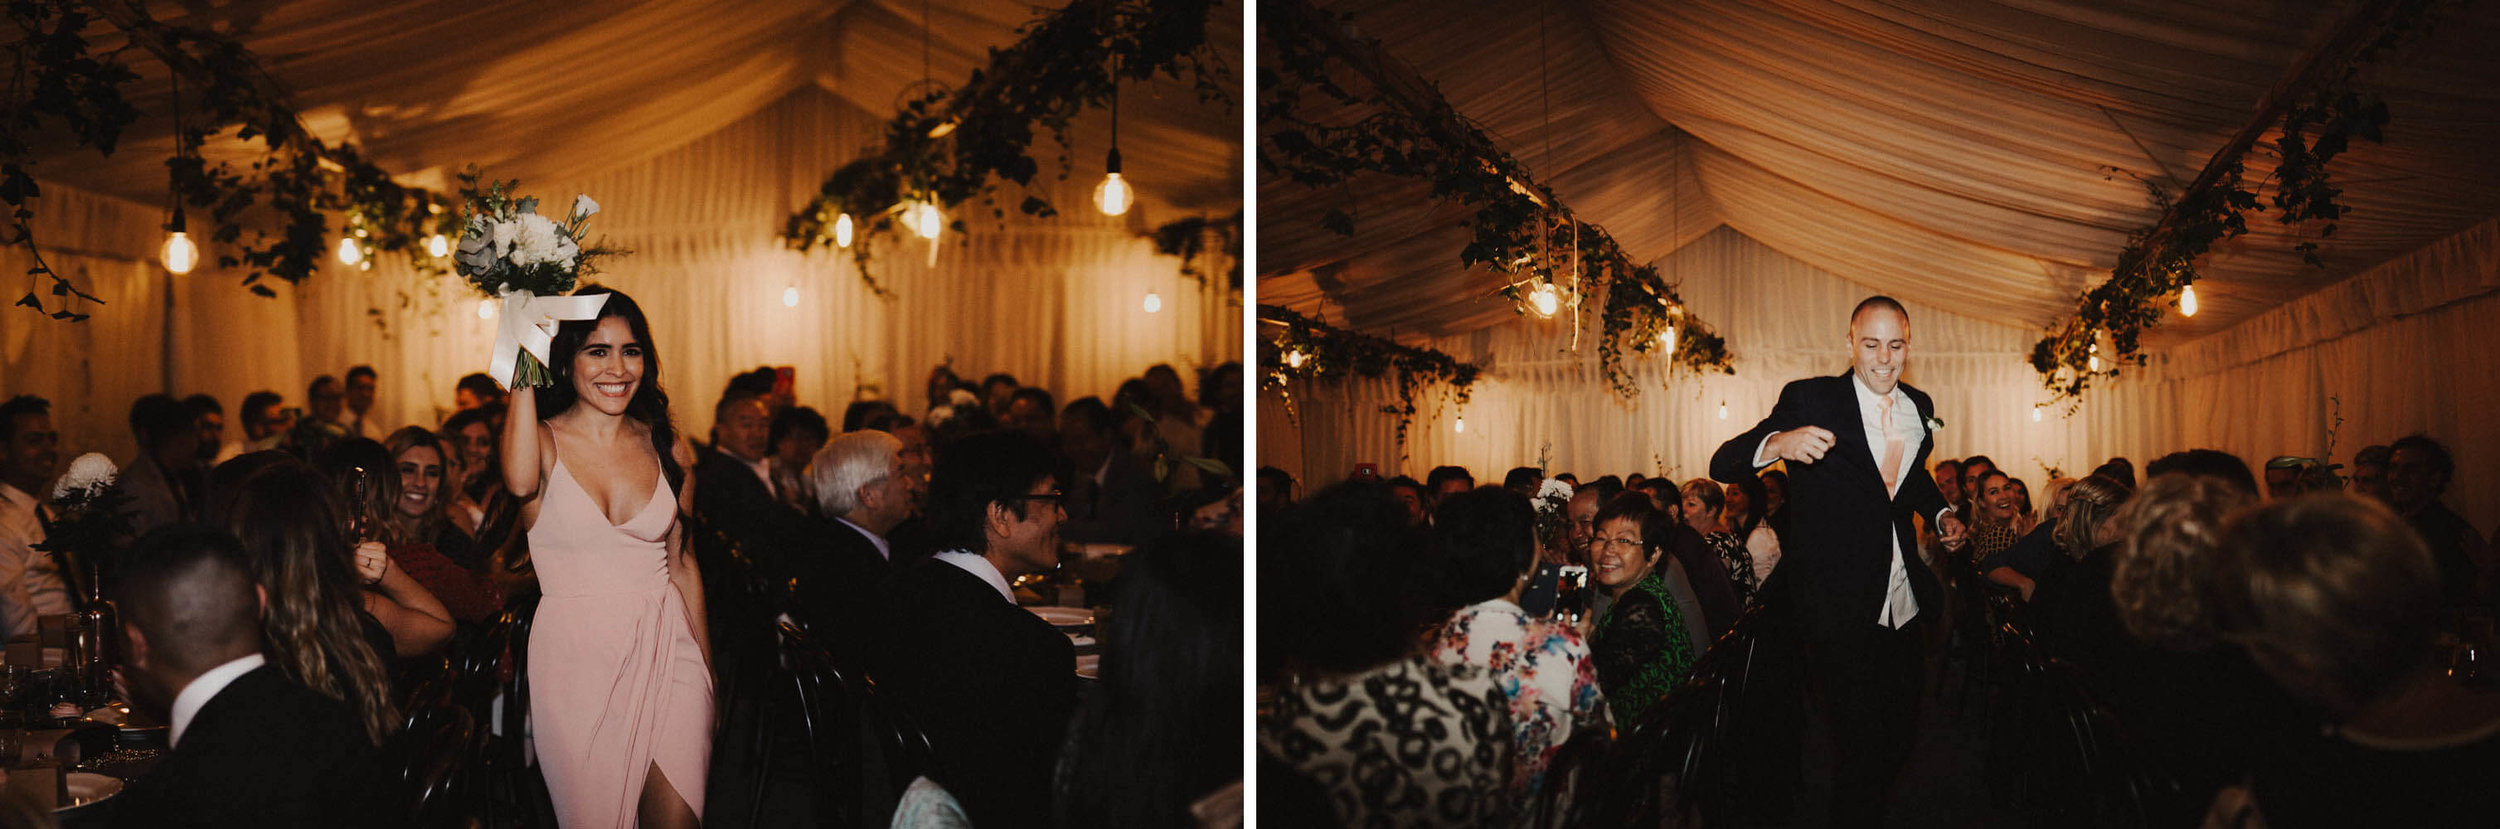 canberra-wedding-rose-gardens_245(8894)2.jpg